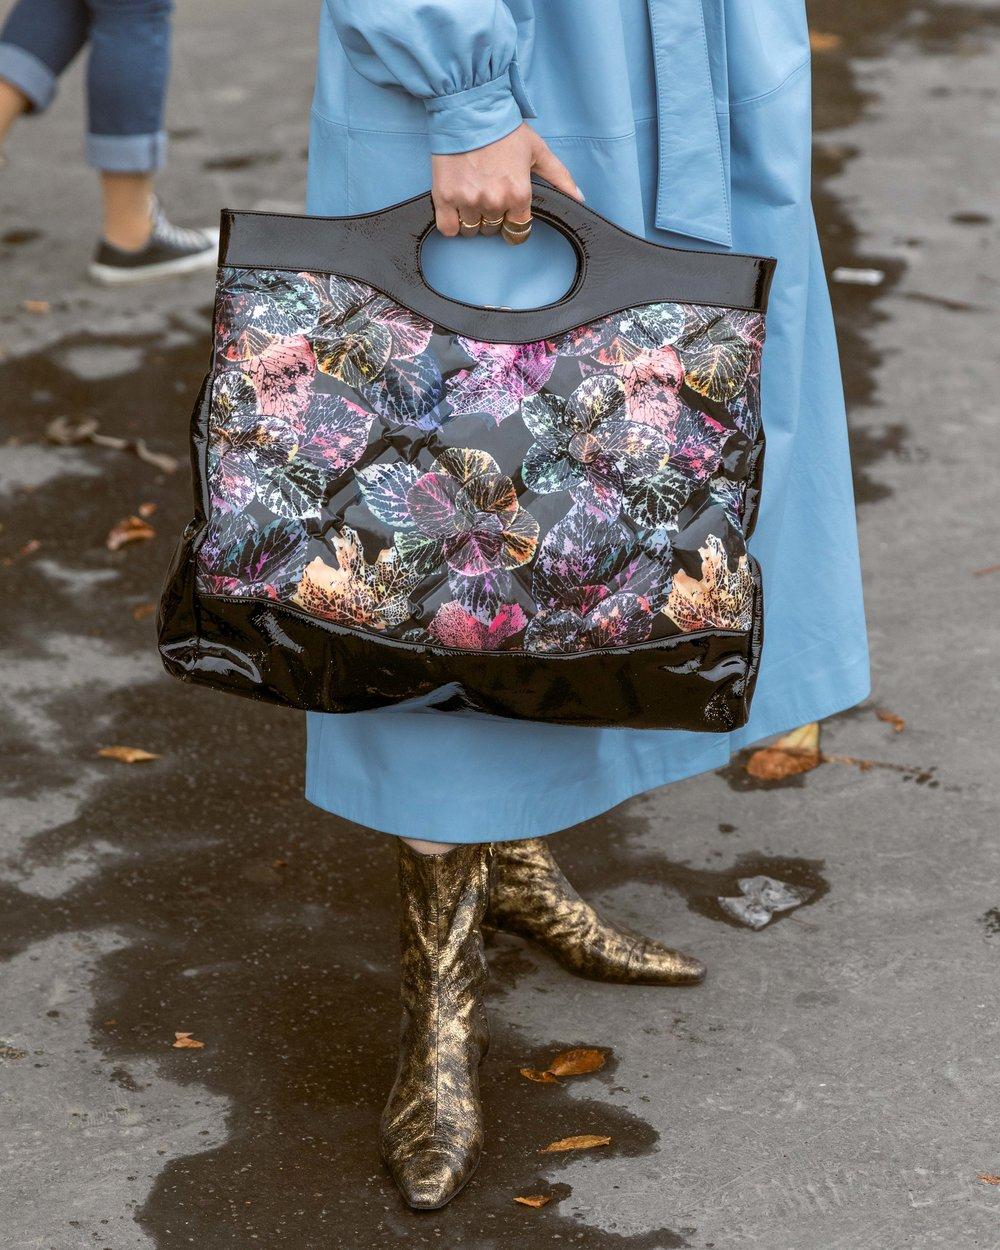 Streetstyle-photography-Chanel-Paris-Fashion-Week-copyright-Alexis-Breugelmans-035.jpg